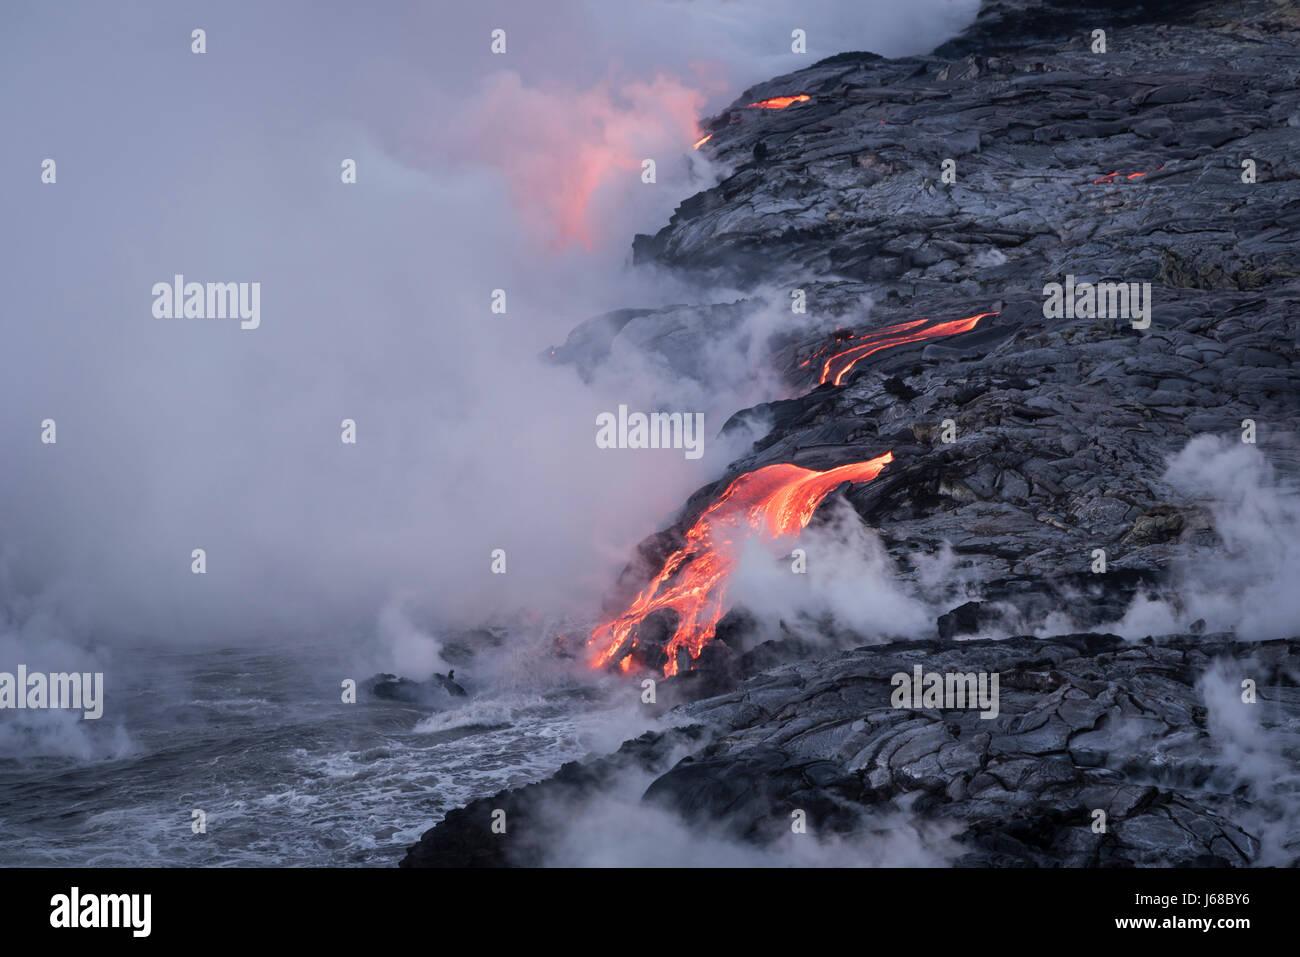 Lava from Pu'u O'o eruption entering the ocean; Hawaii Volcanoes National Park, Island of Hawaii. - Stock Image